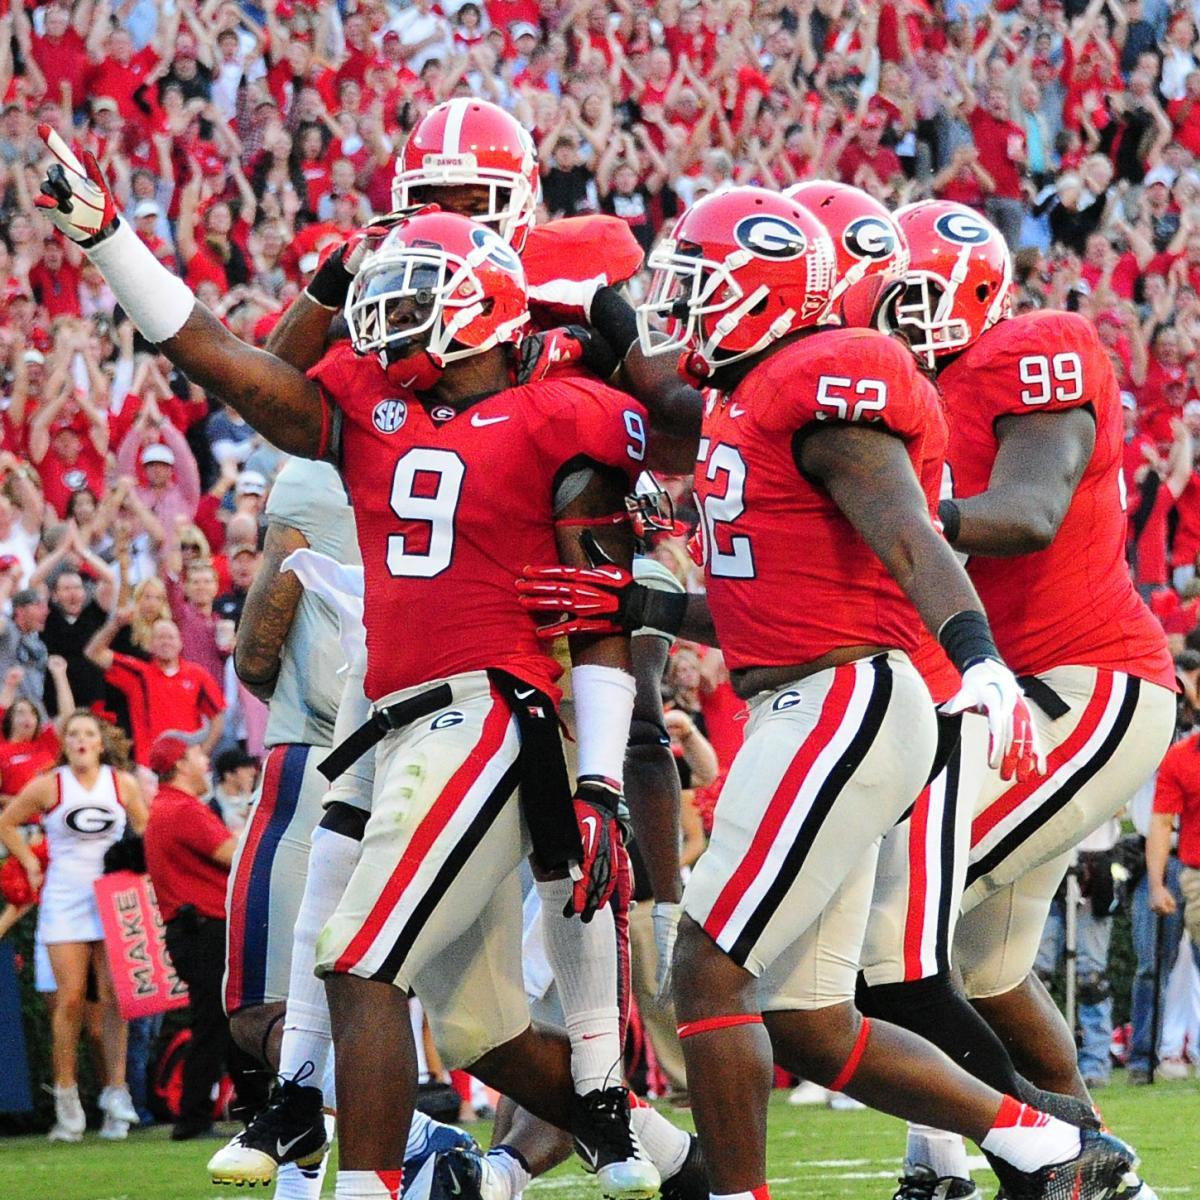 Georgia vs Auburn: TV Schedule, Live Stream, Radio, Game ...